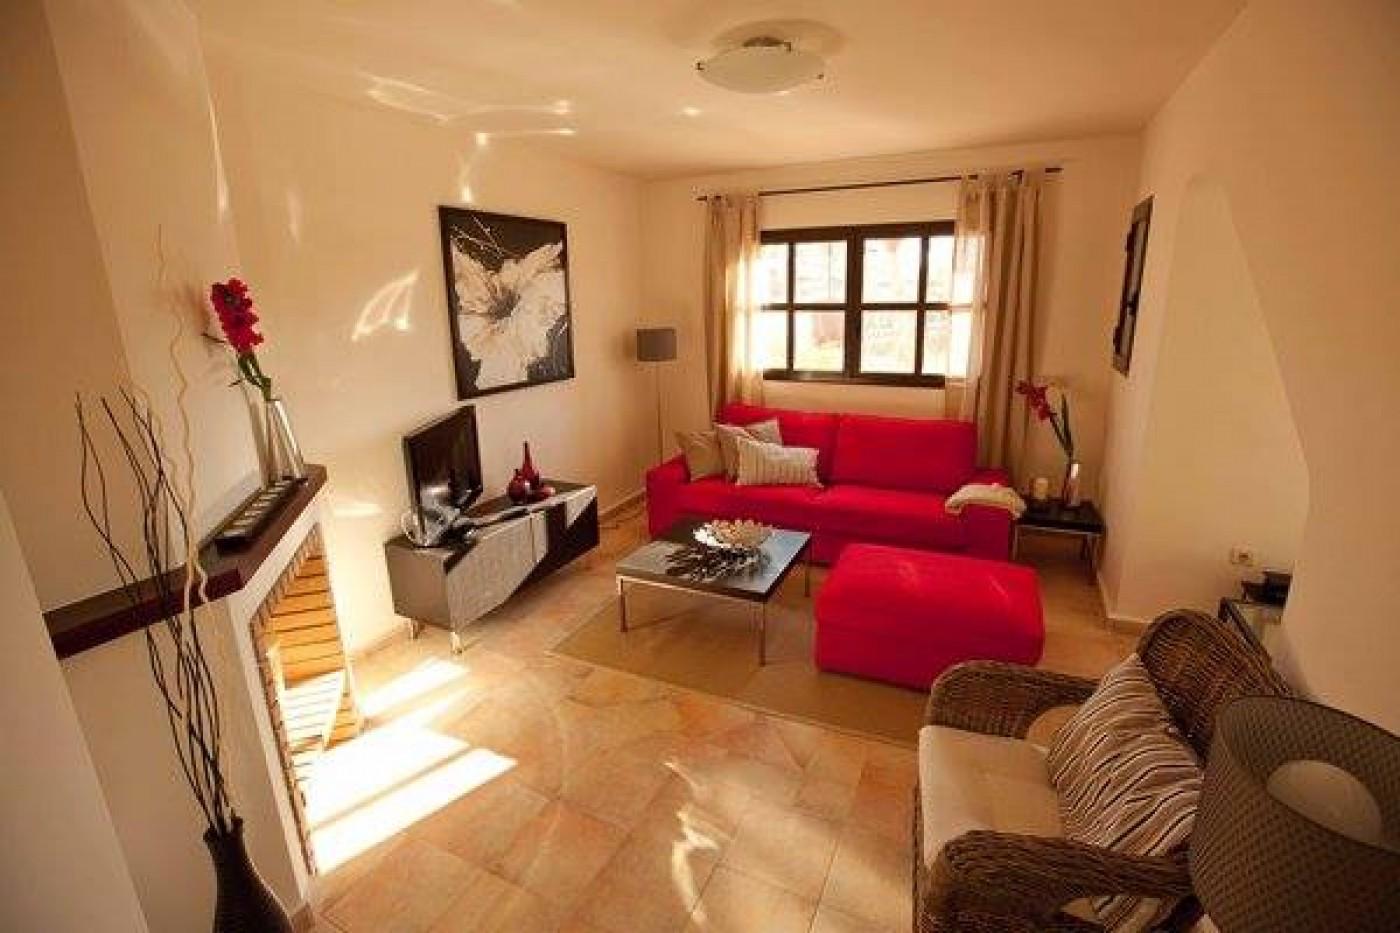 Home Space Sales & Rentals